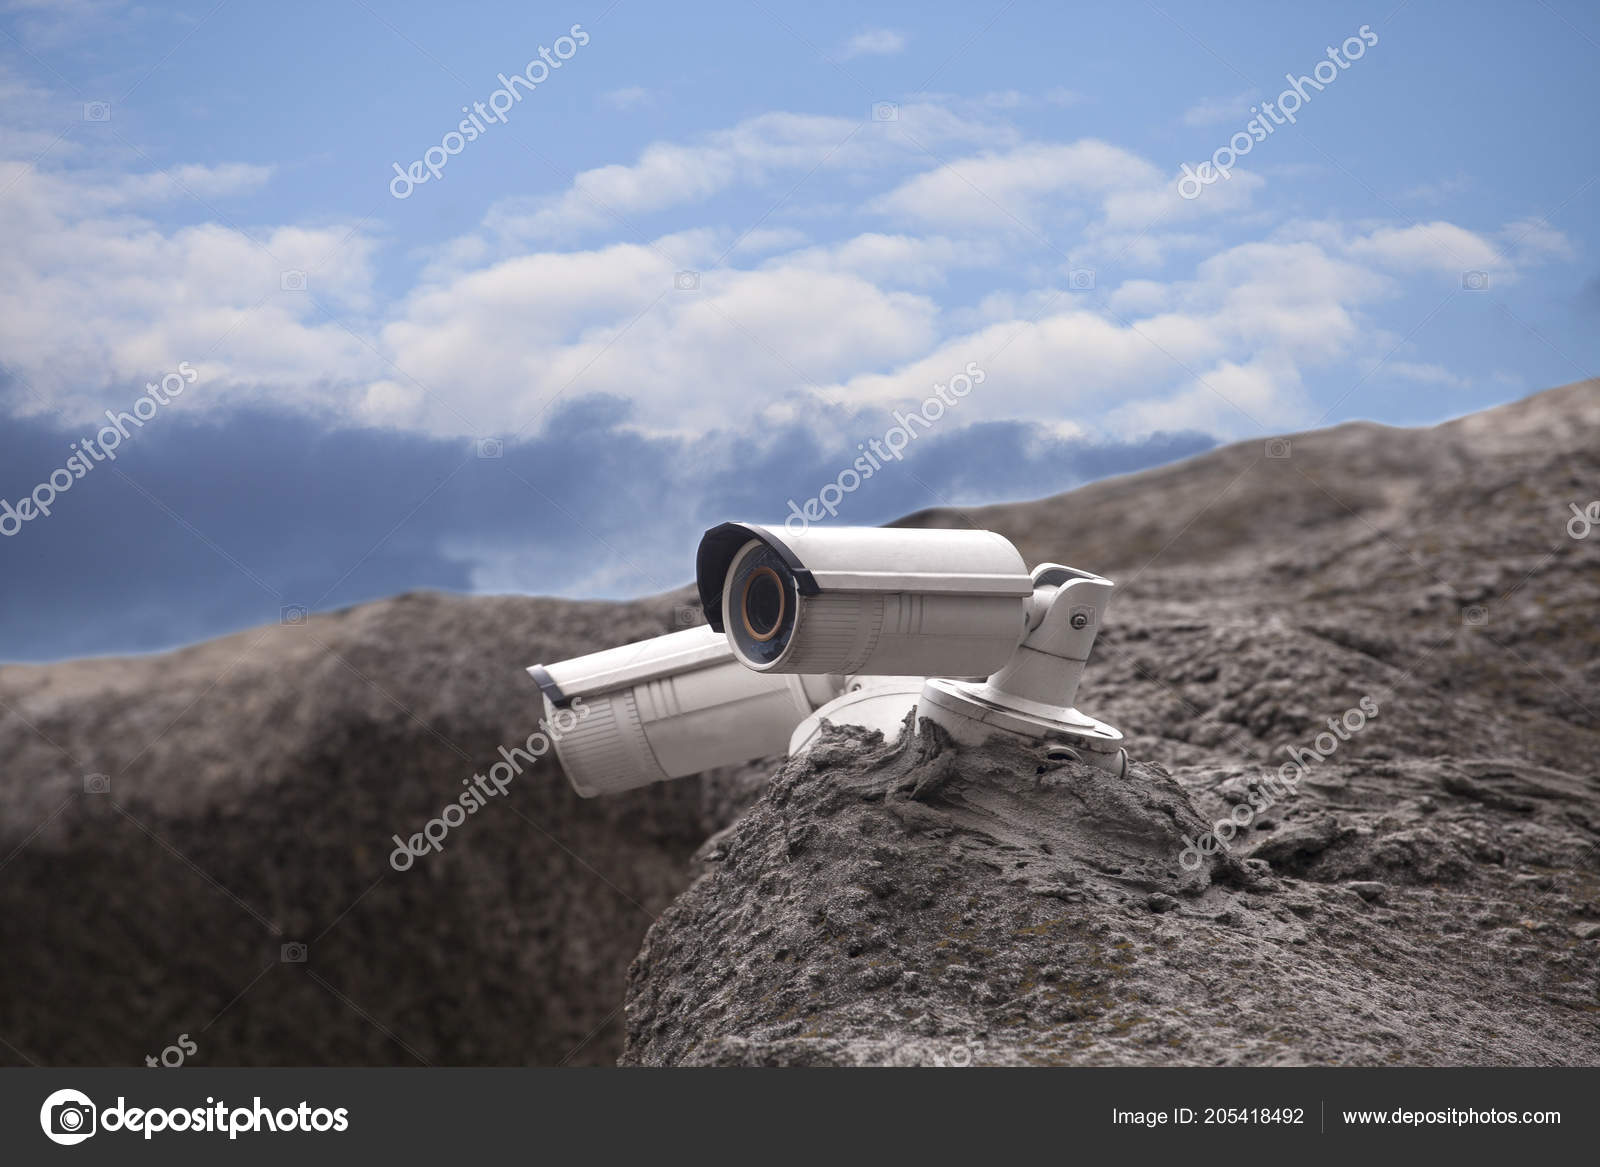 Rock Camera Surveillance : Surveillance security camera rock blue sky background u2014 photographie